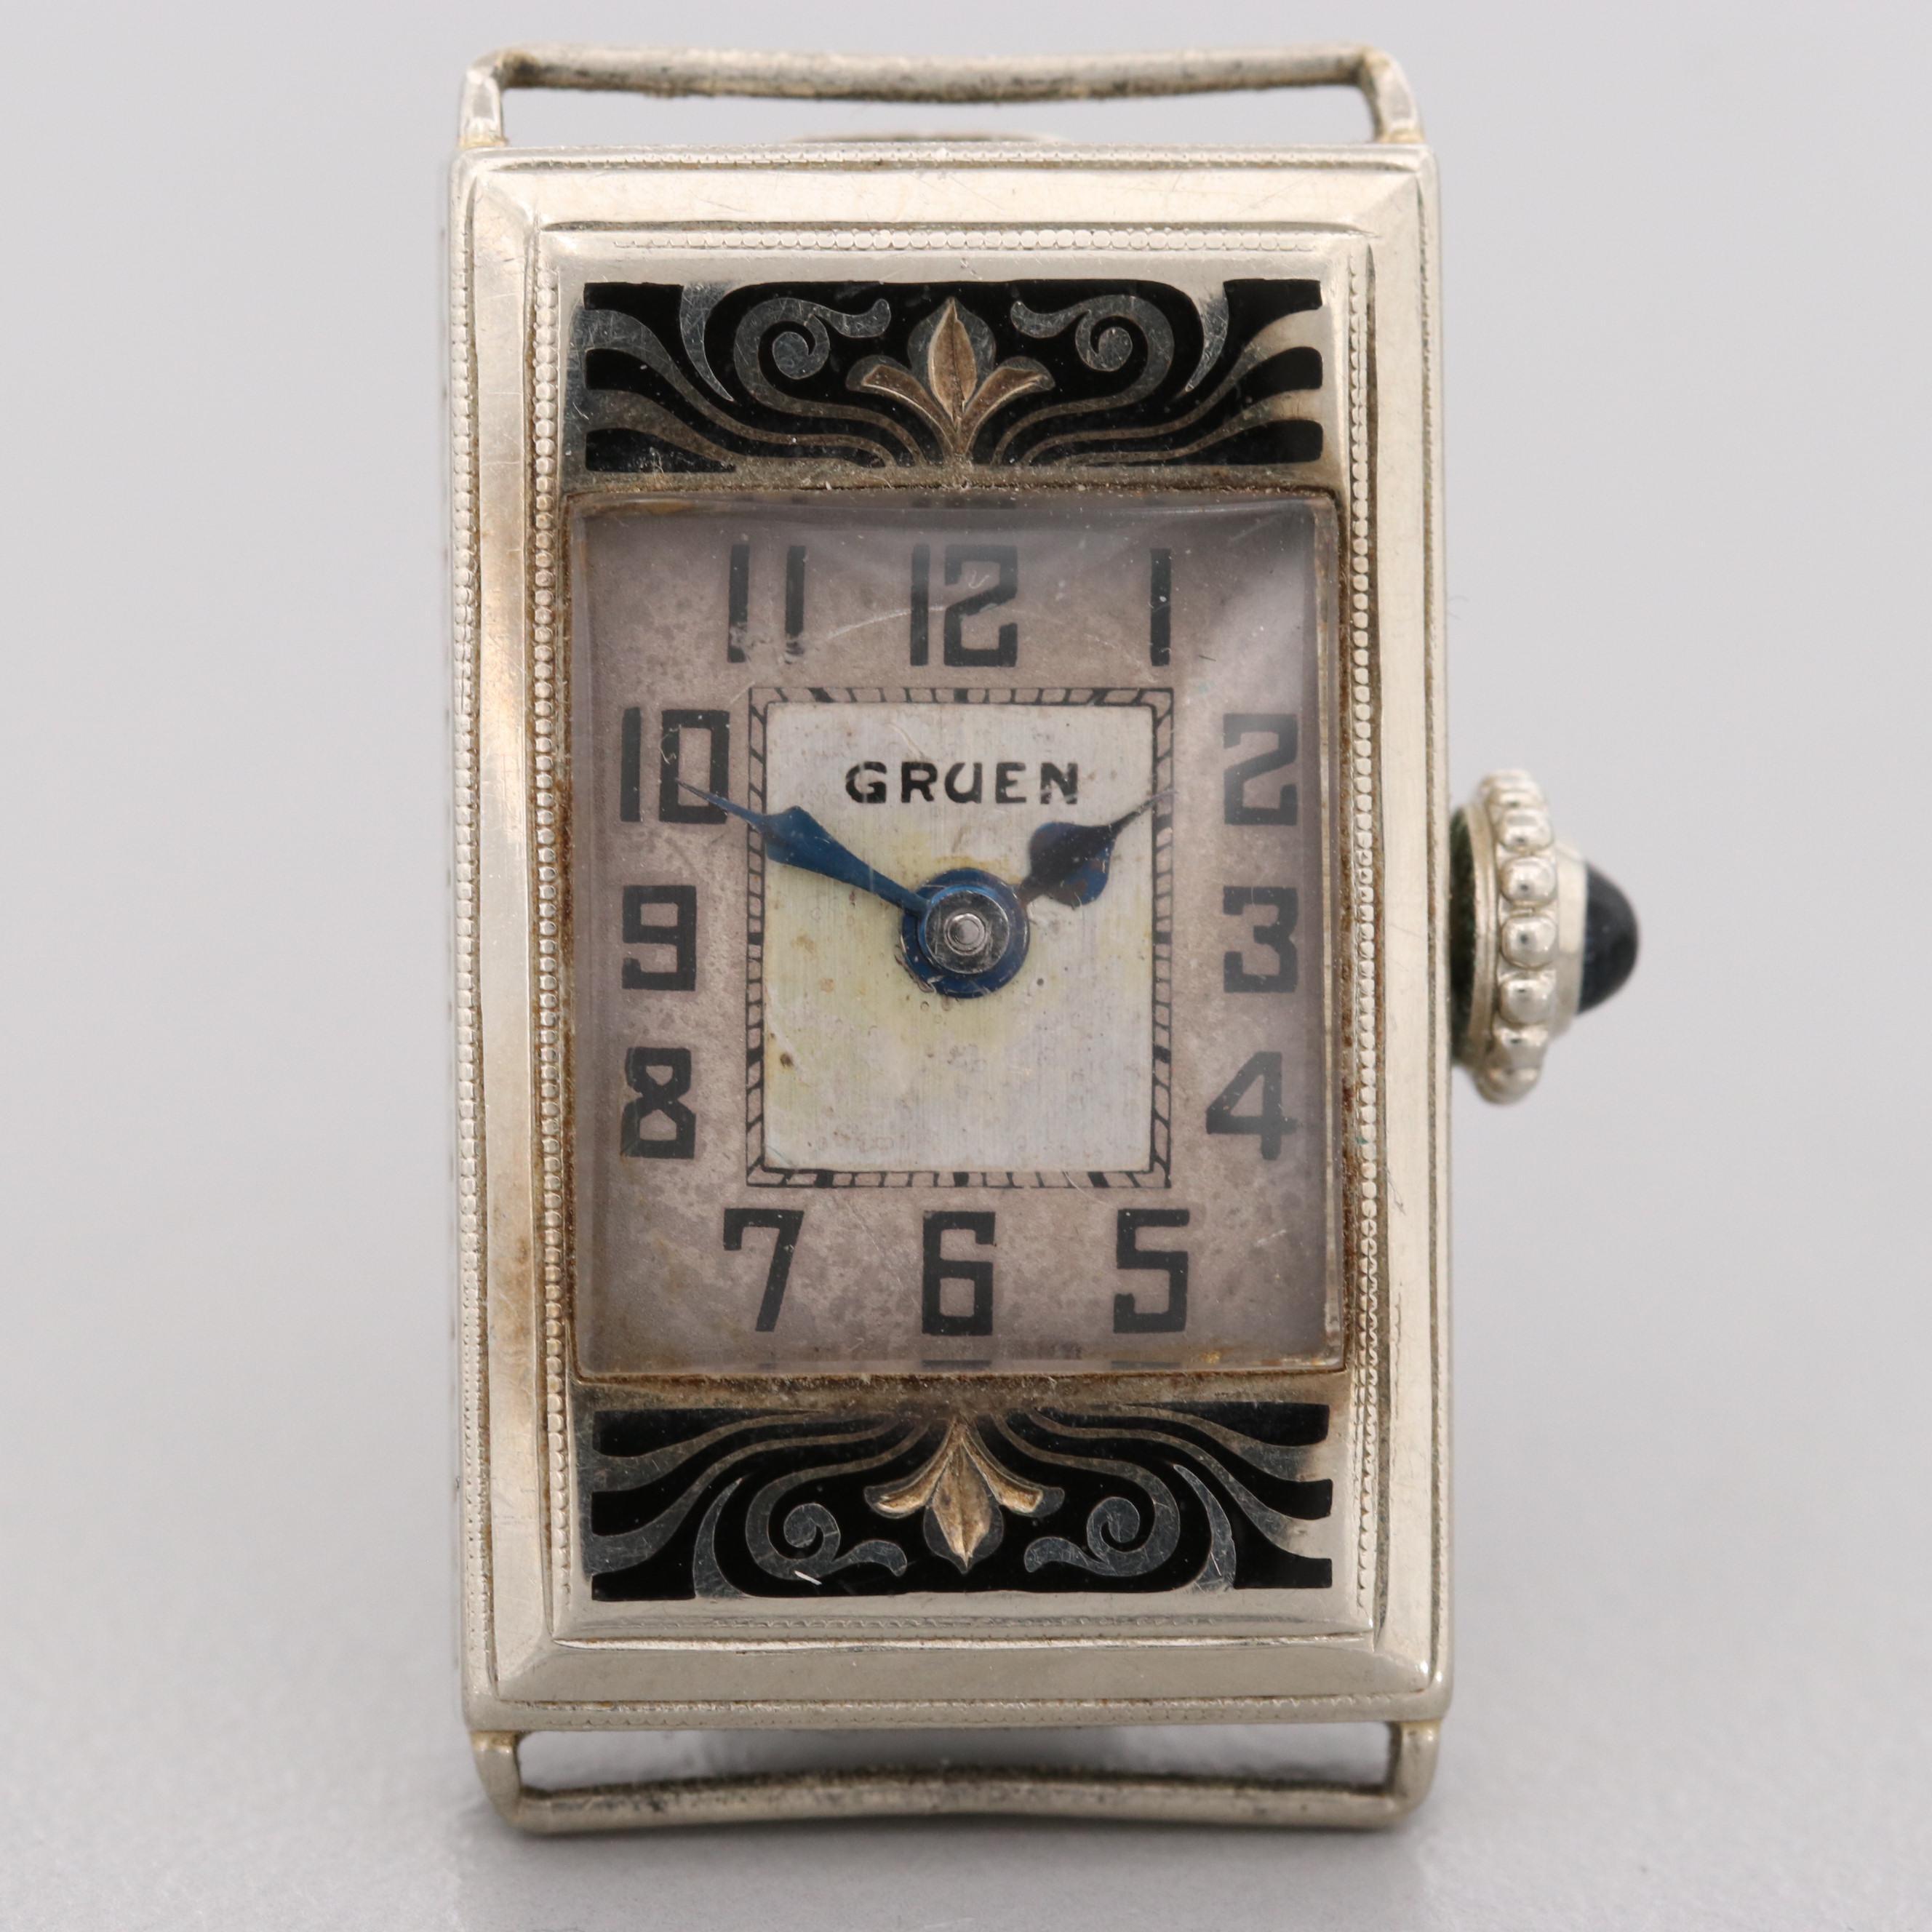 Gruen 14K White Gold Niello Style Wristwatch